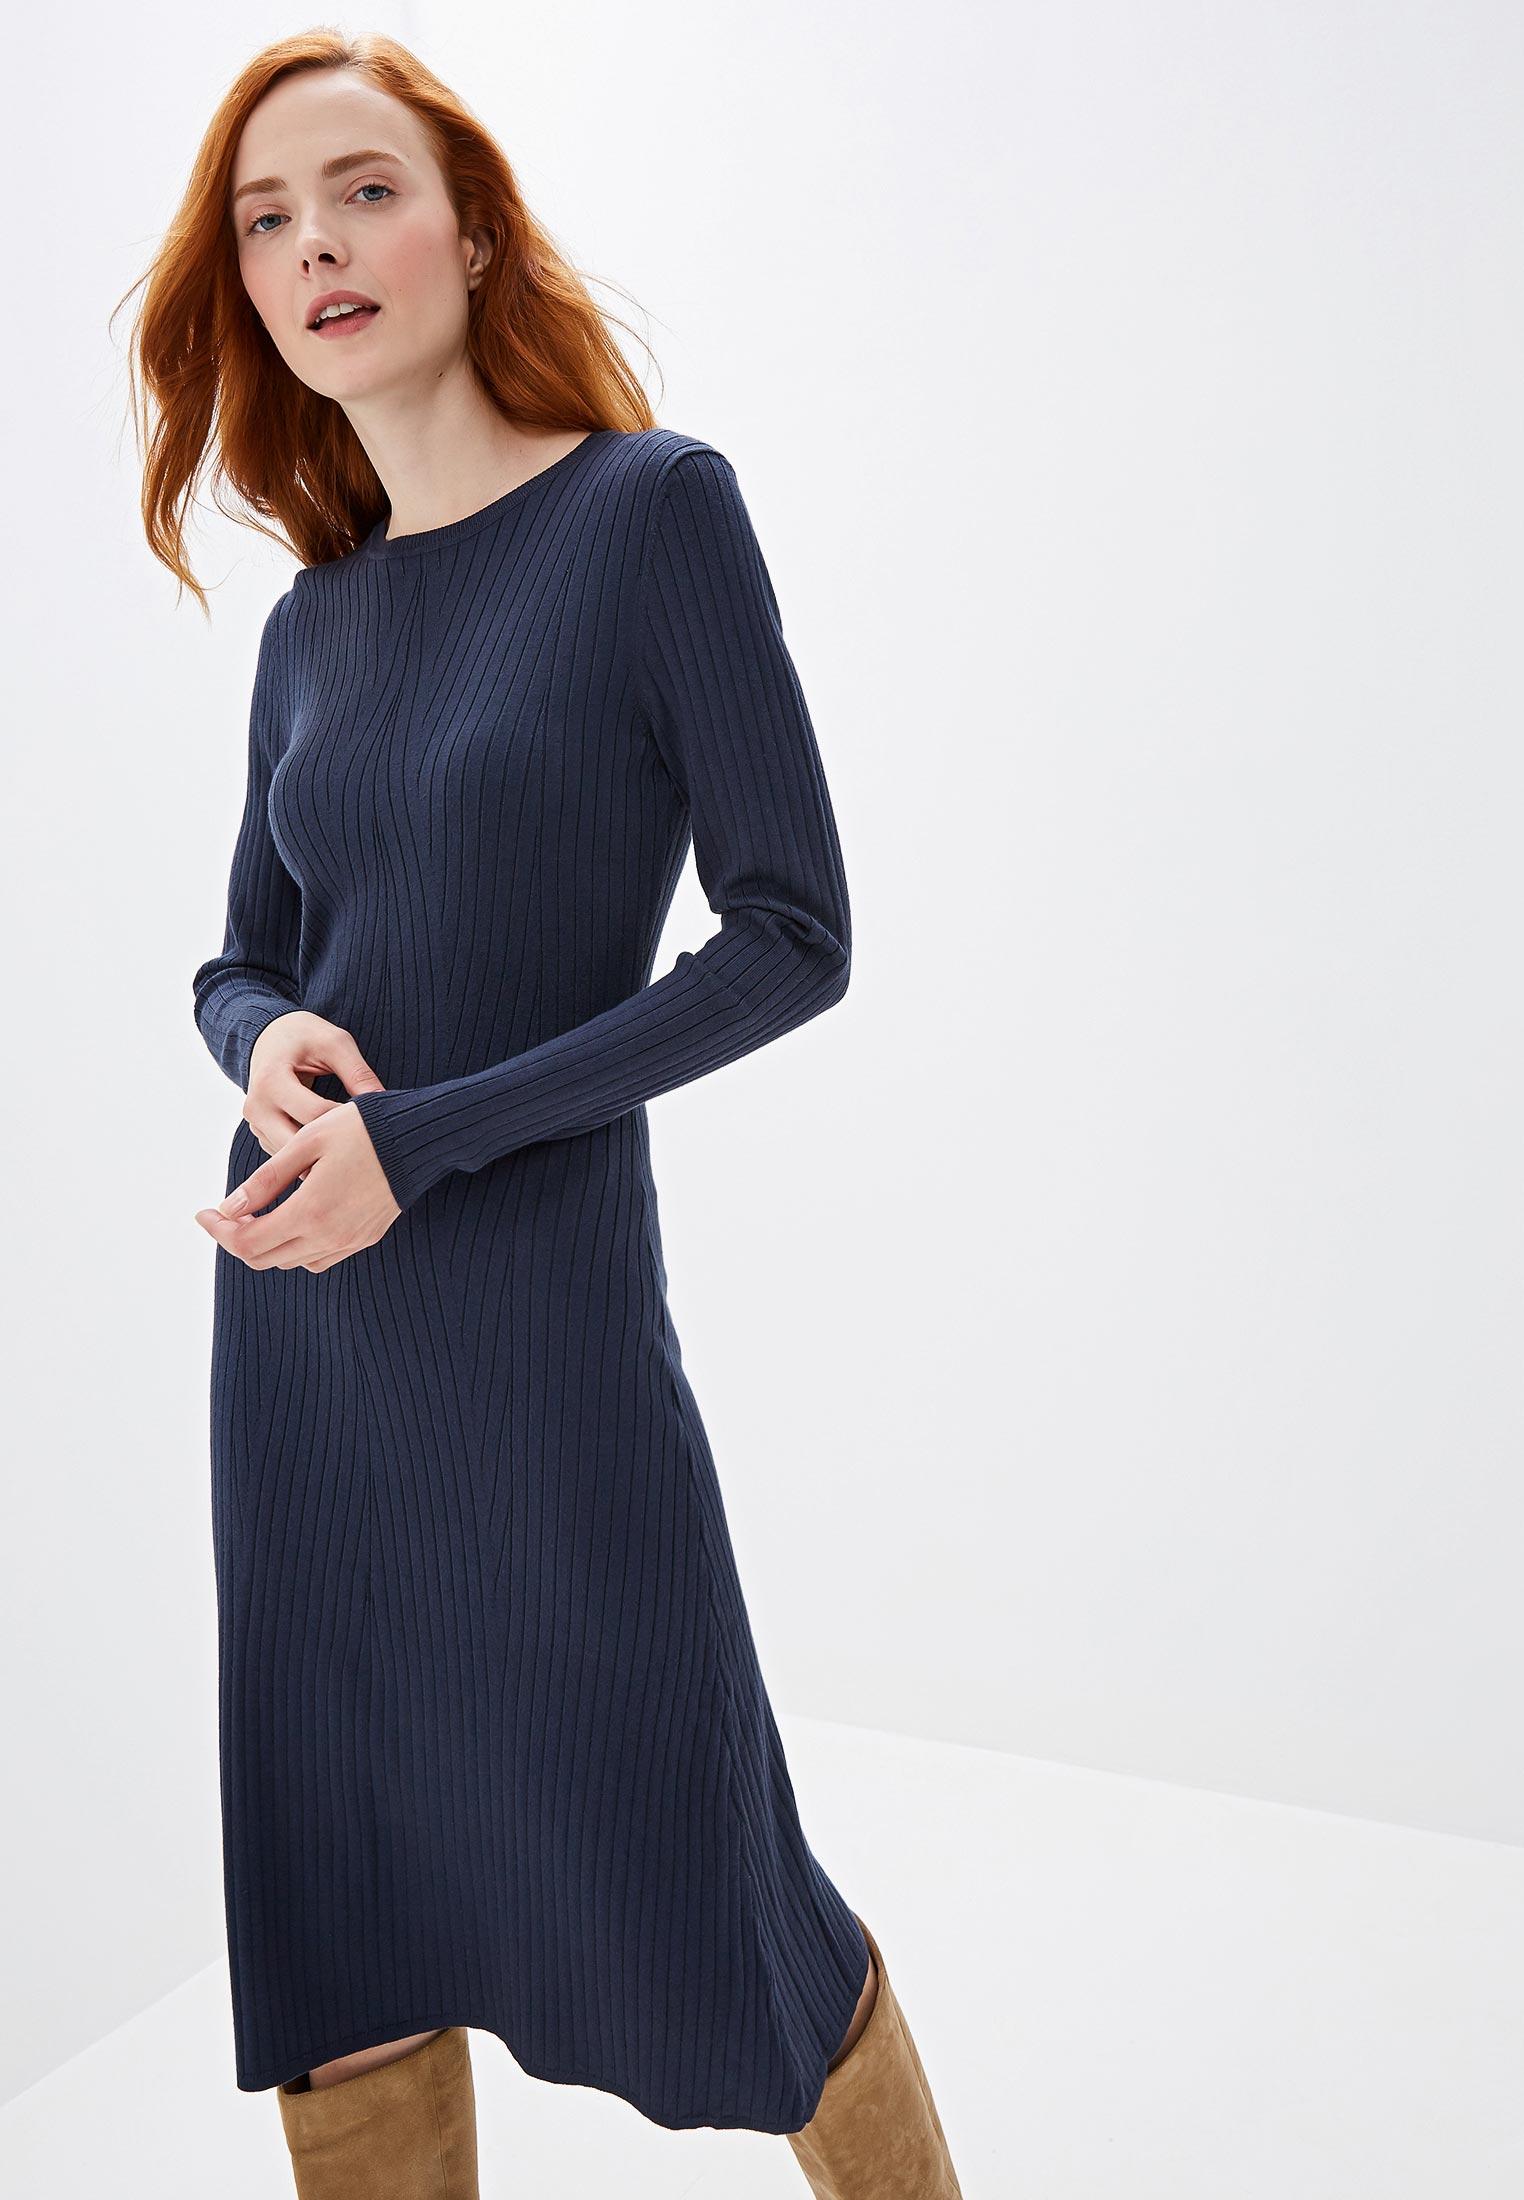 Вязаное платье Sela (Сэла) DSw-117/1262-9331